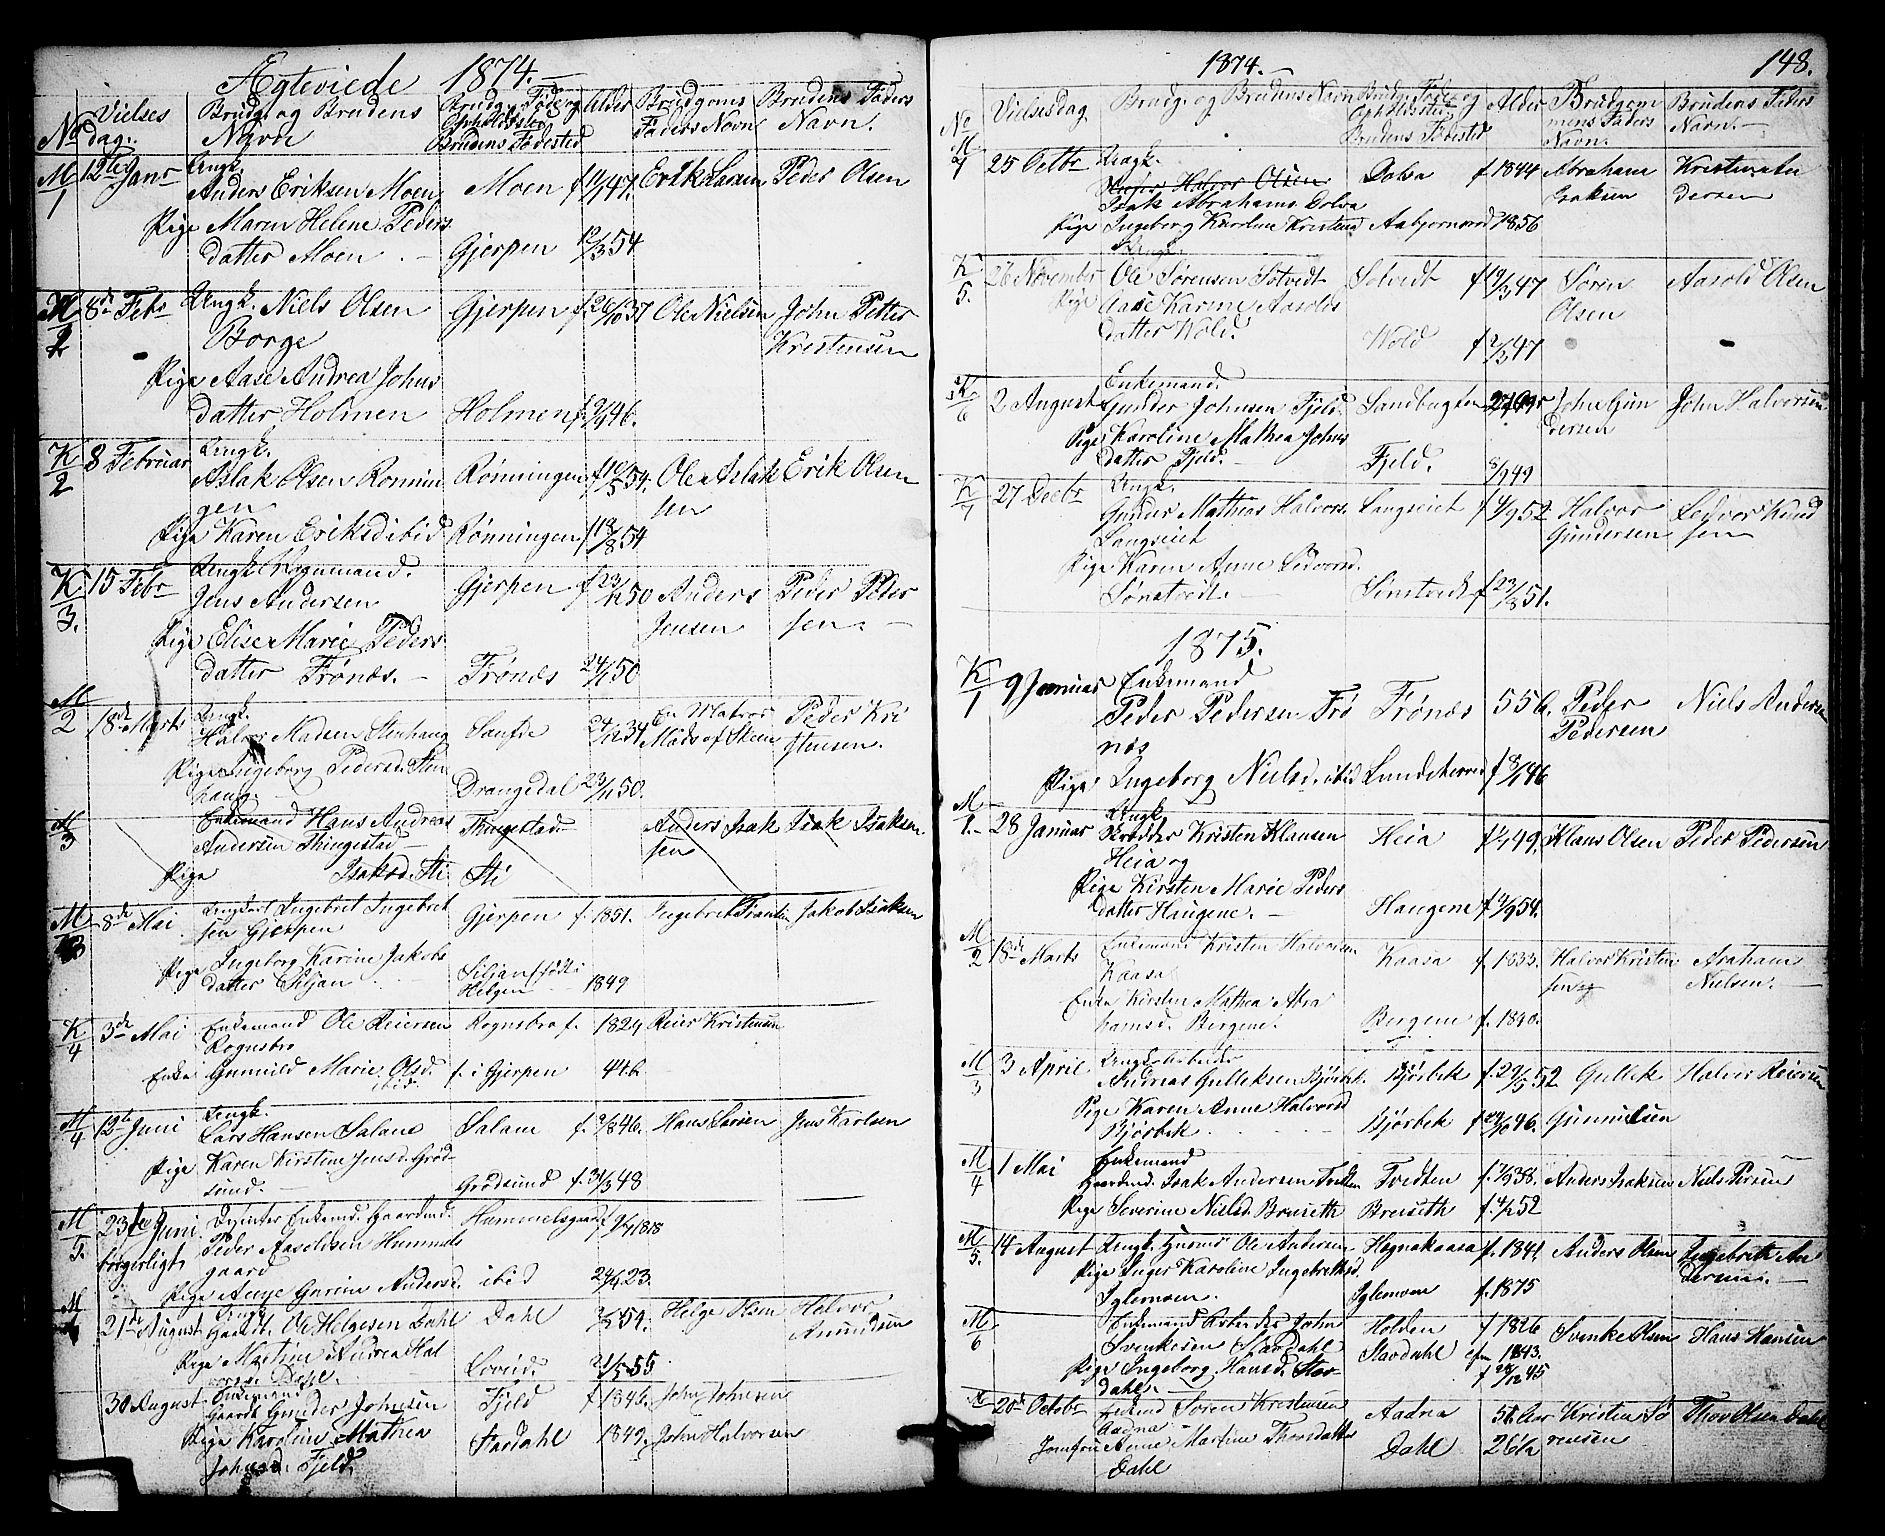 SAKO, Solum kirkebøker, G/Gb/L0002: Klokkerbok nr. II 2, 1859-1879, s. 148